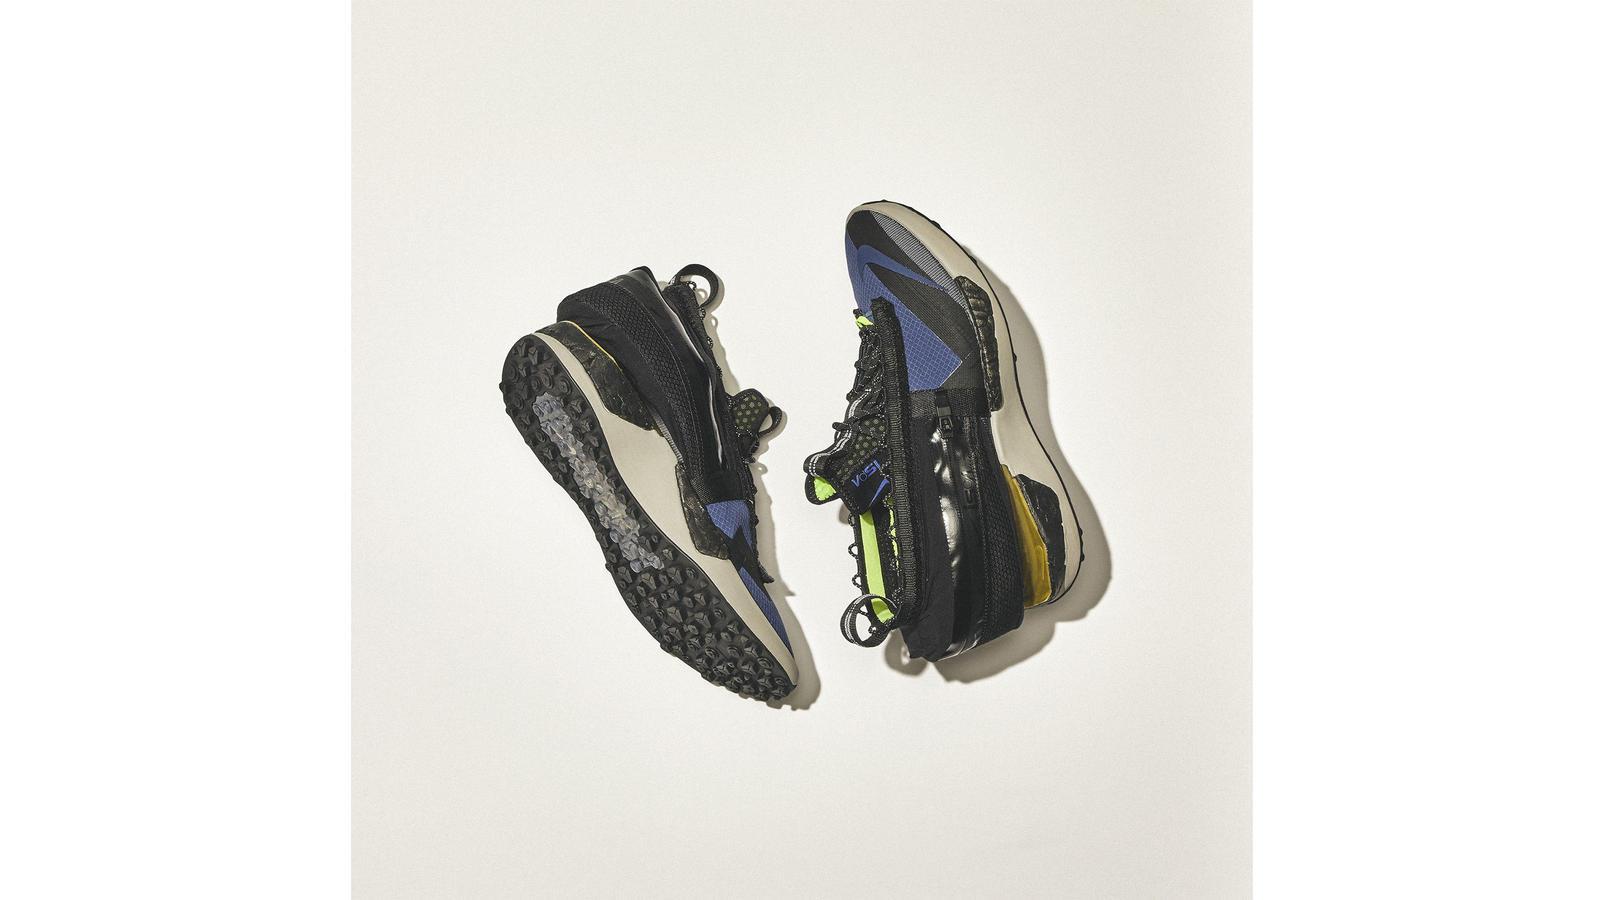 Nike ISPA Drifter Gator 10